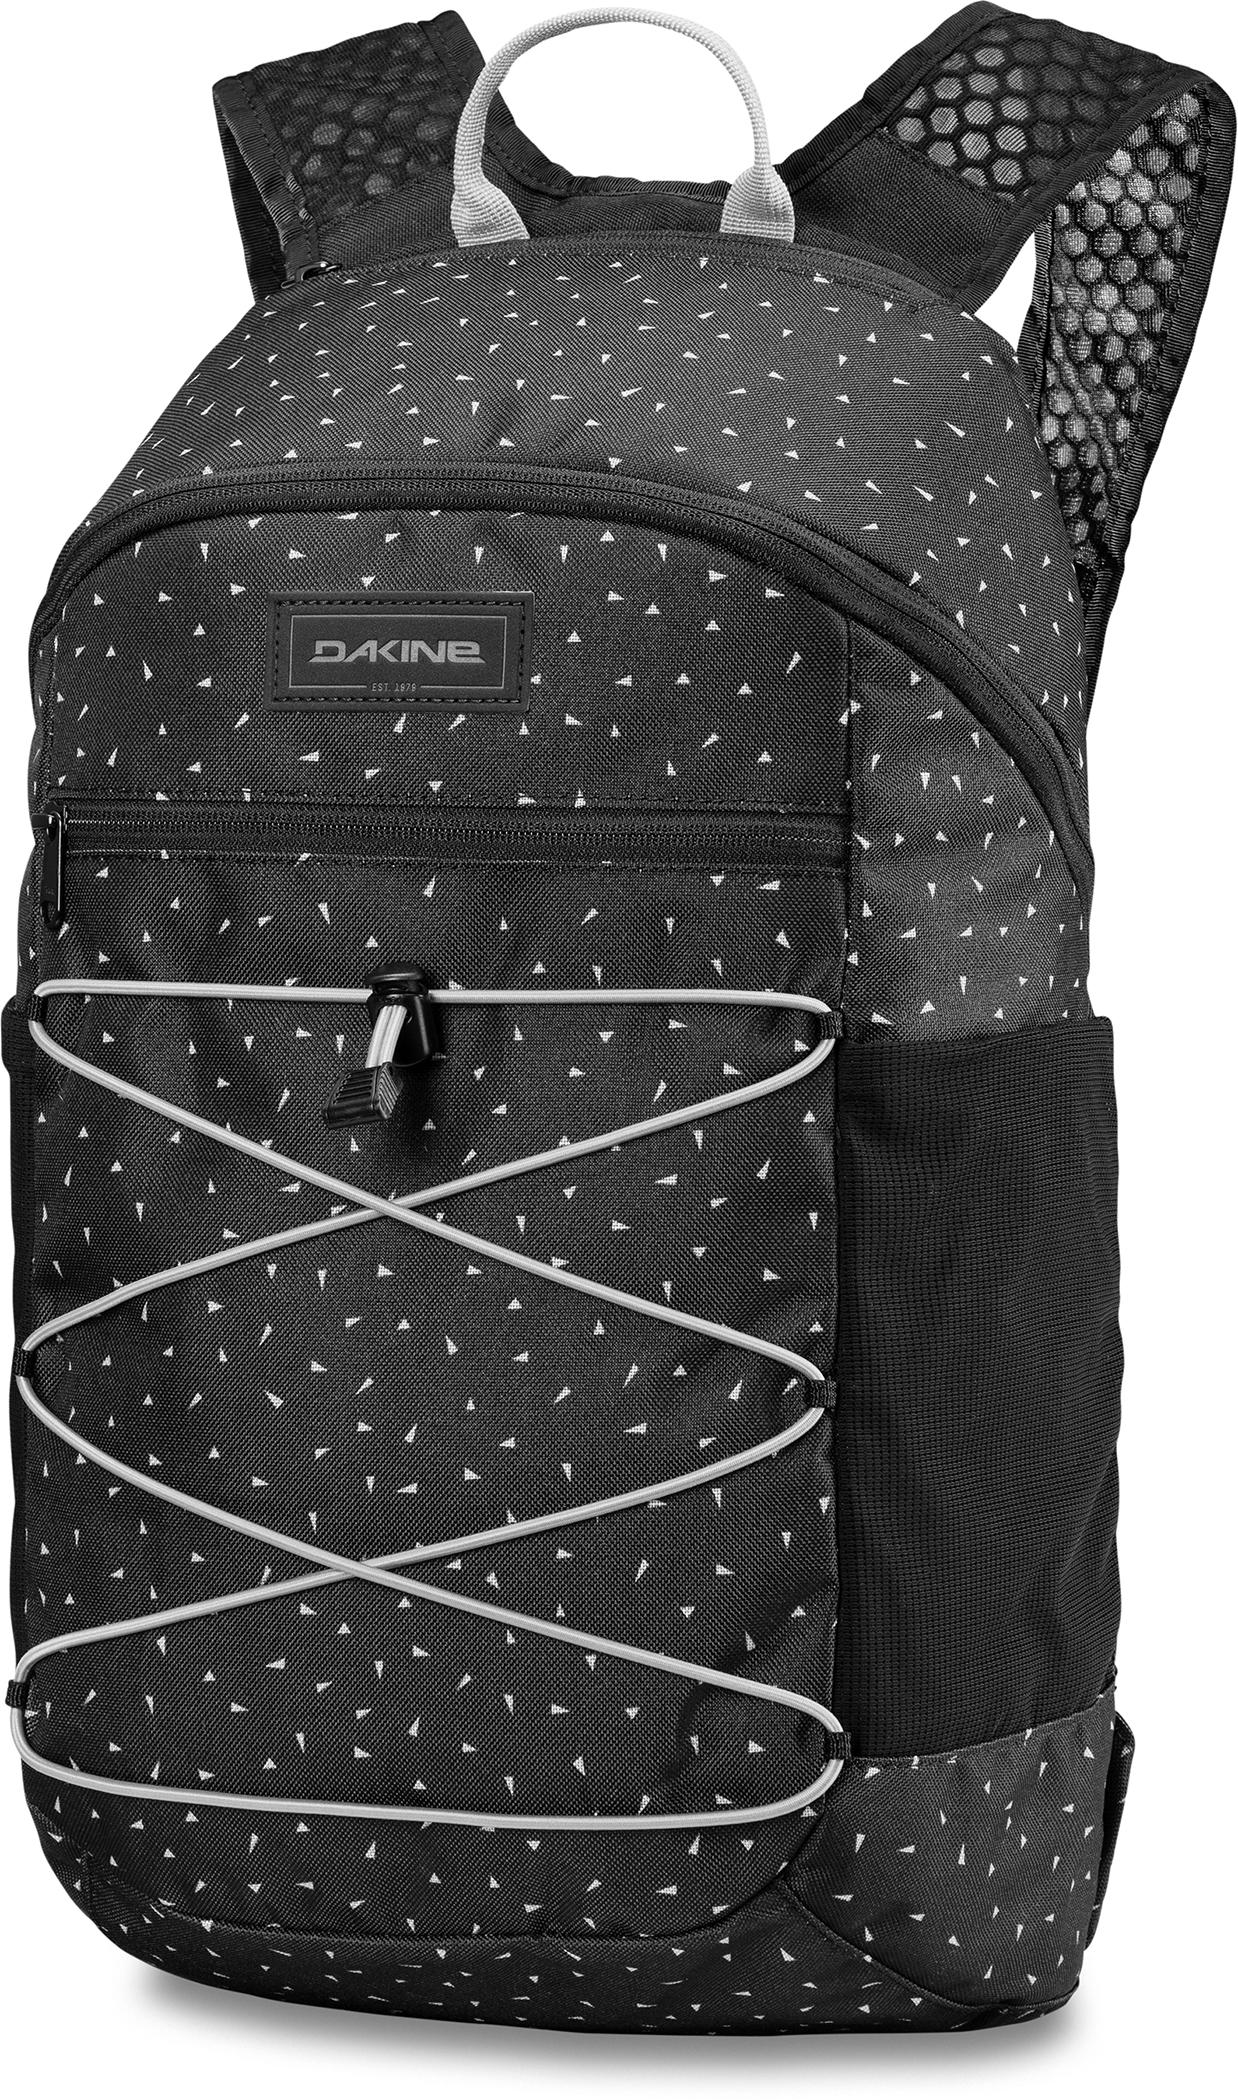 12ec165c98f Dakine Pack - Wonder Sport Bag - 18L Kiki 610934176520 | eBay